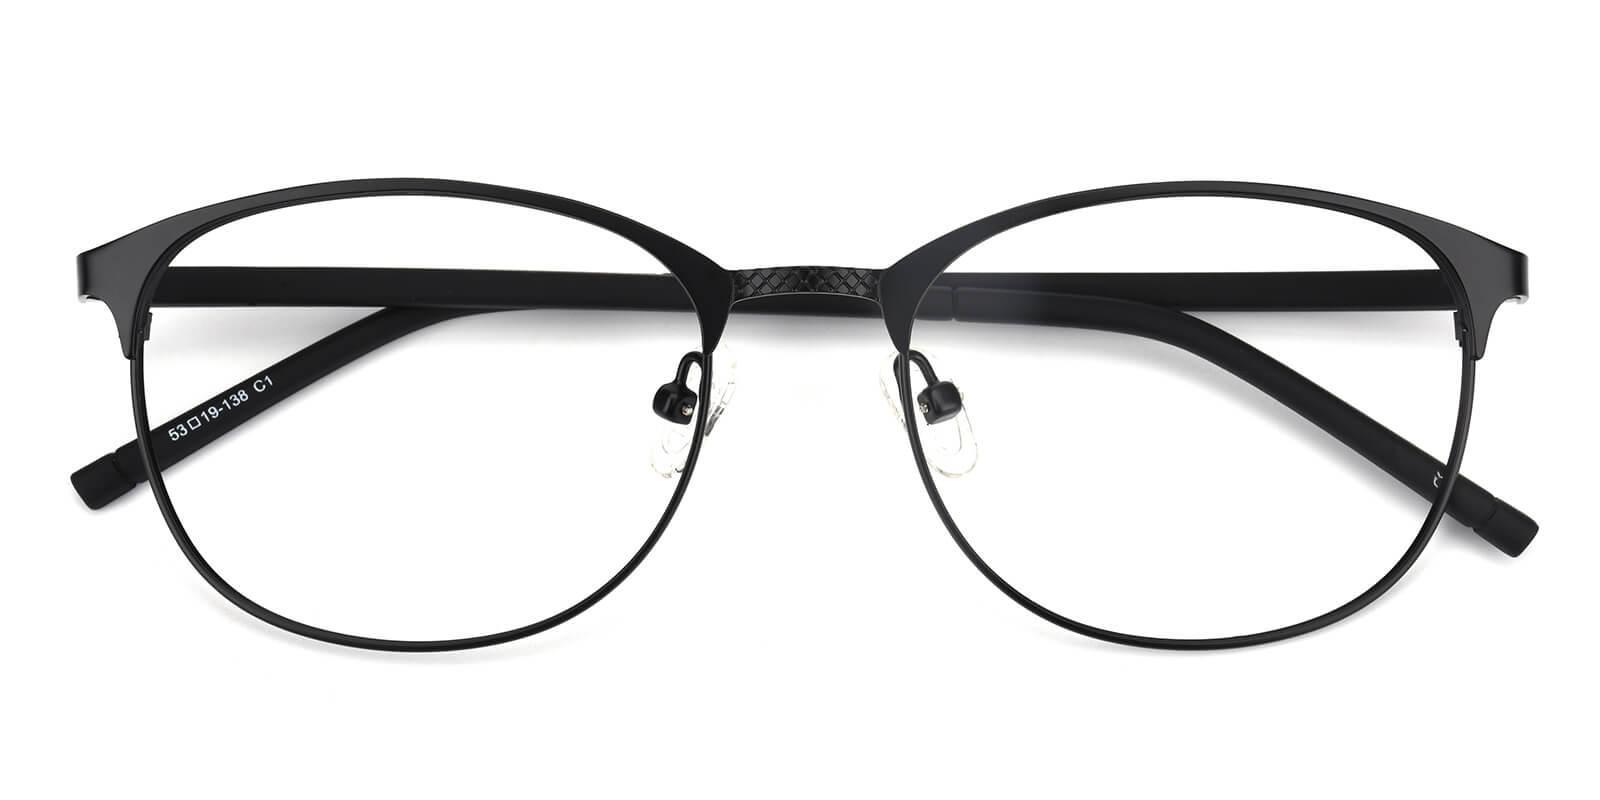 Gorge-Black-Round-Metal-Eyeglasses-detail